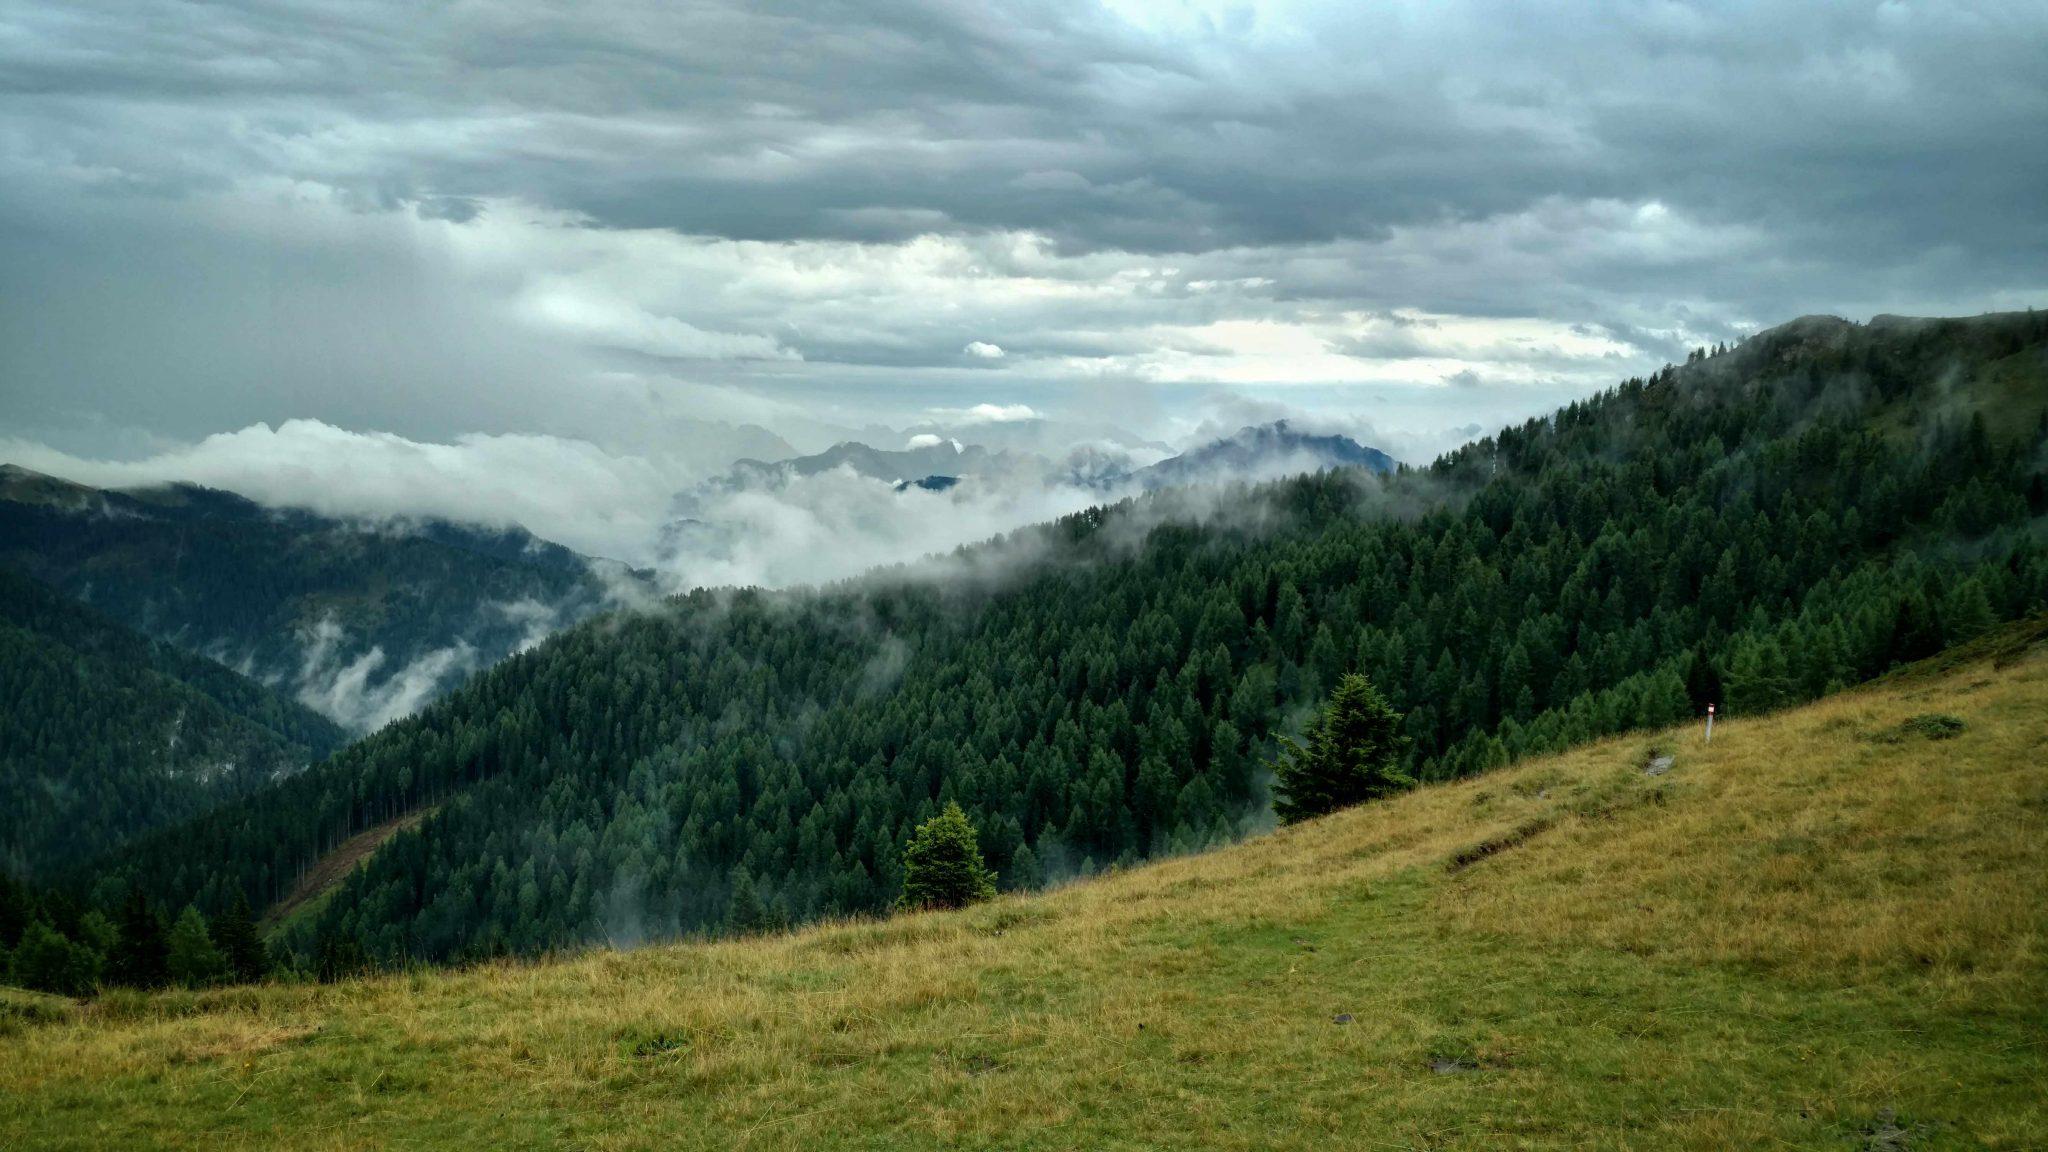 Lekker_onstuimig_weer_bergen